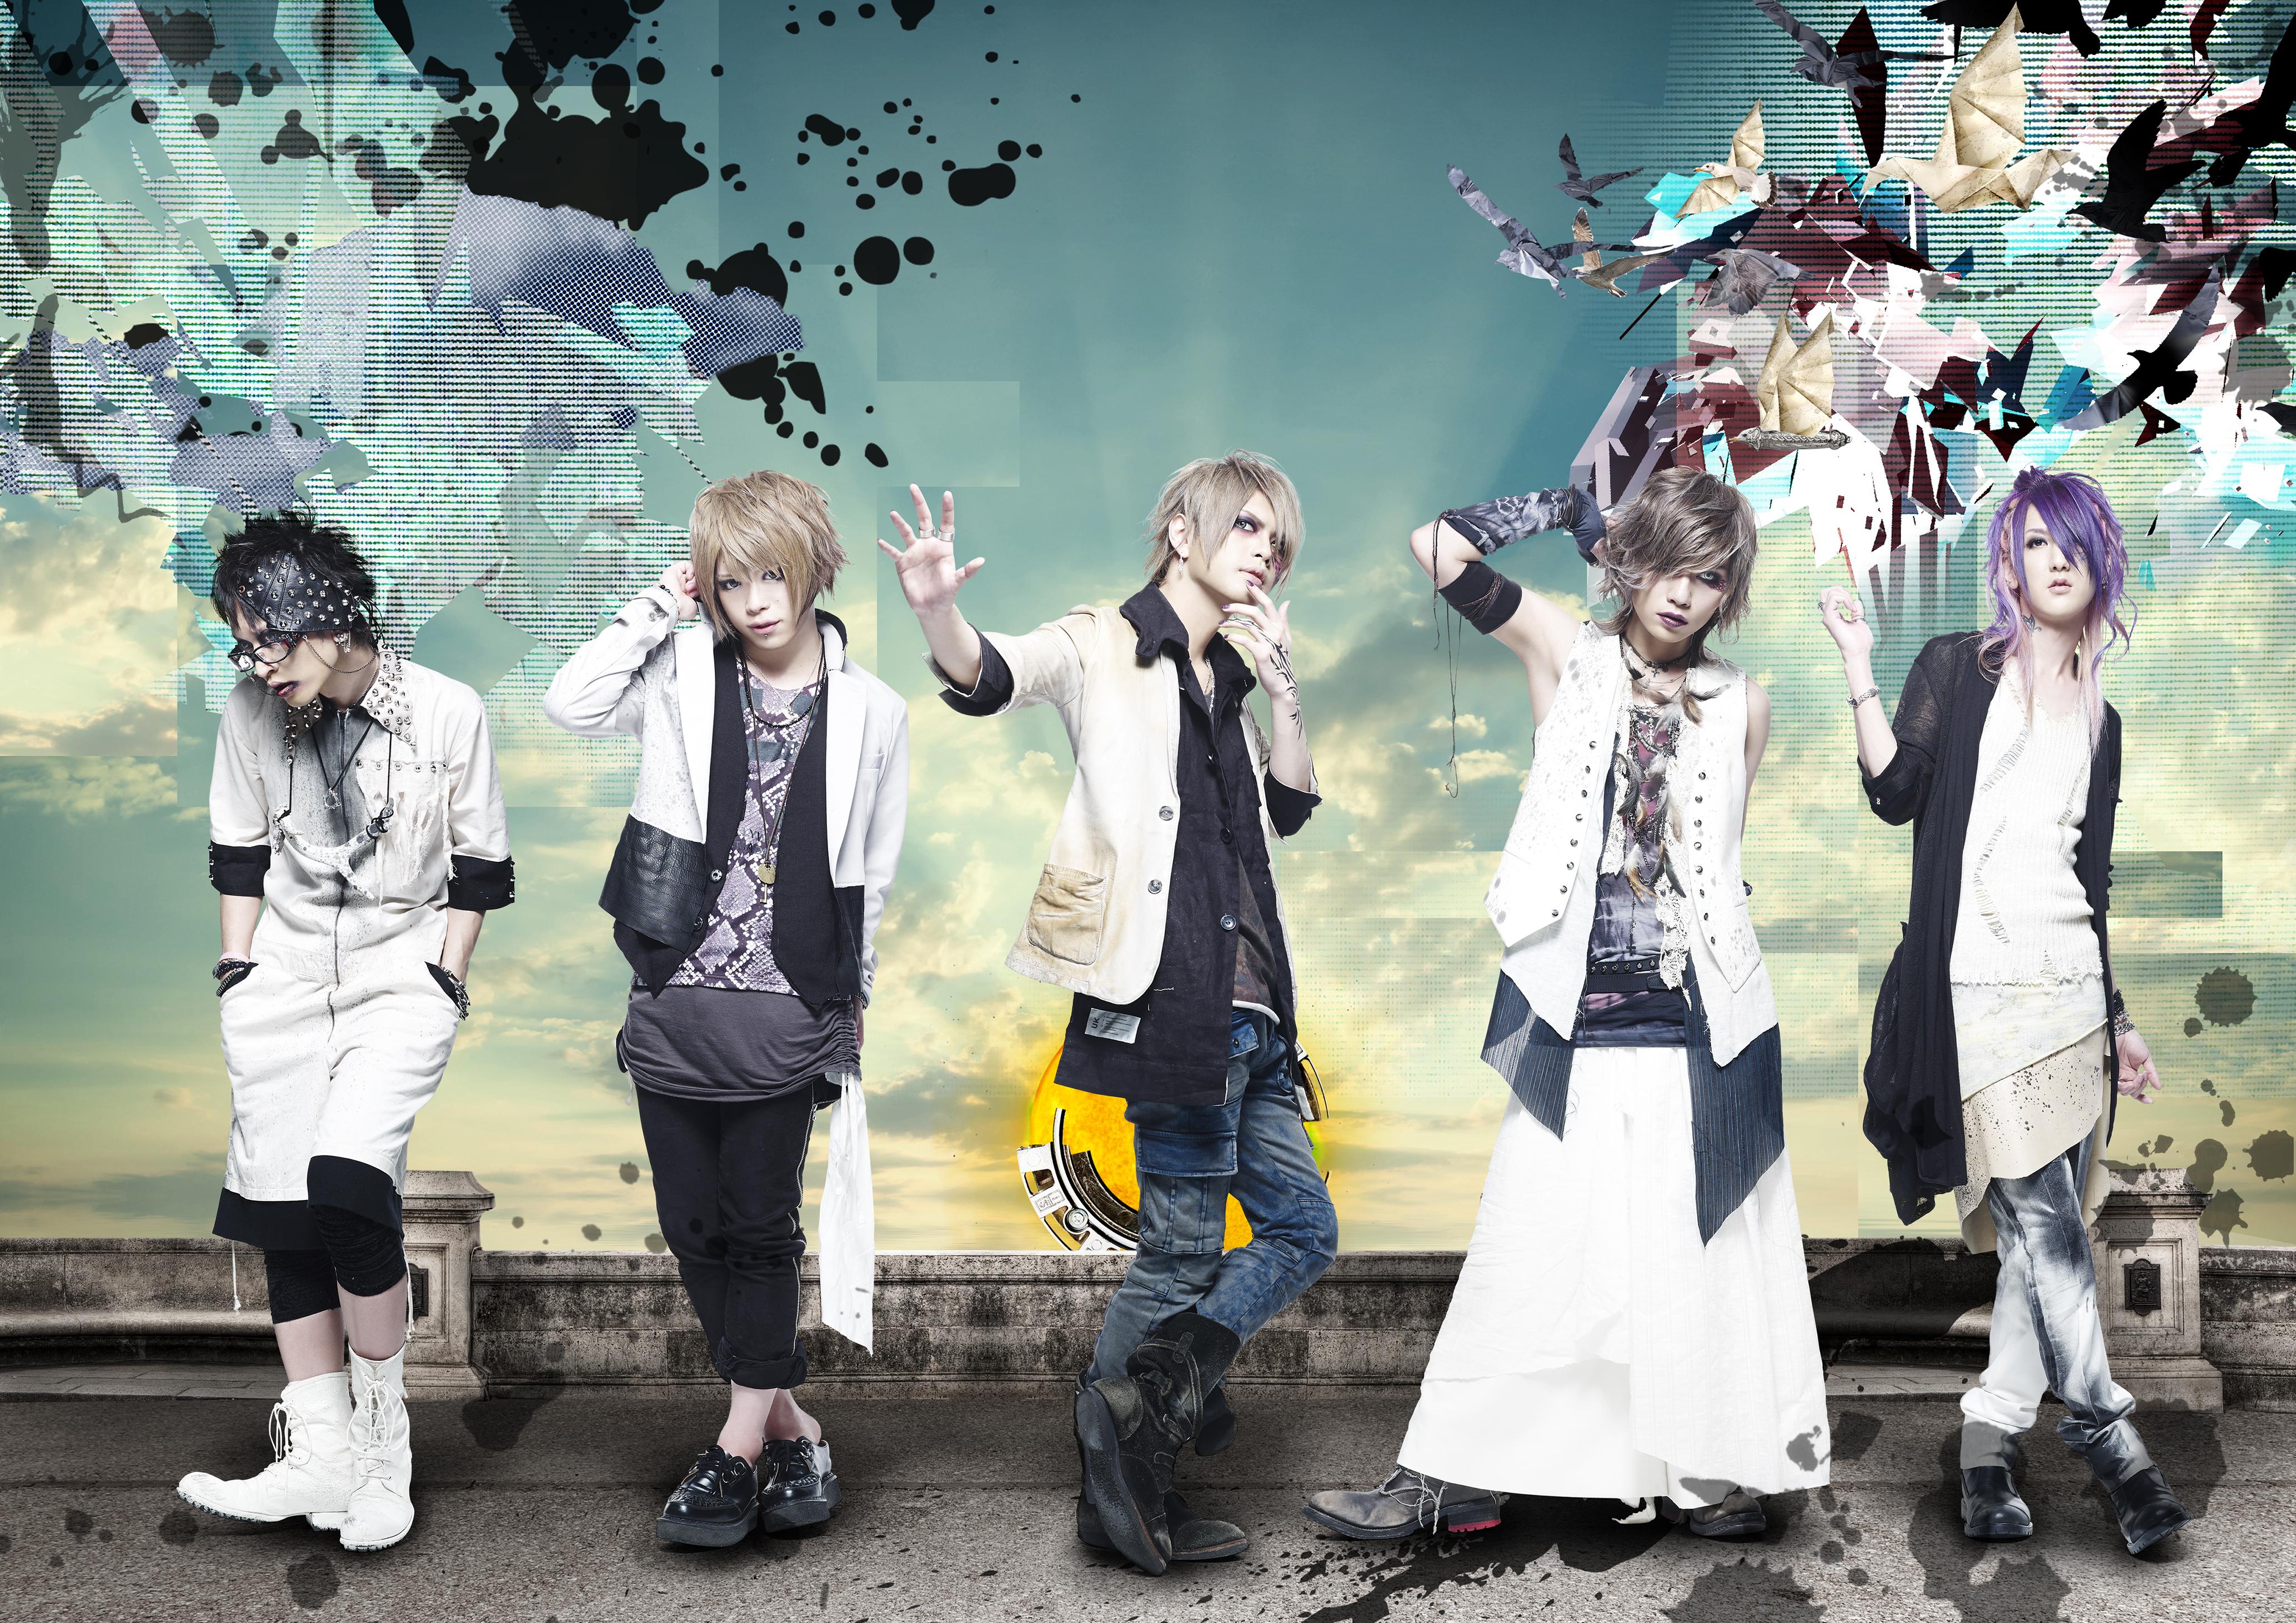 L→R 海(Gu)、Tohya(Dr)、智(Vo)、瑠伊(Ba)、Yuh (Gu)